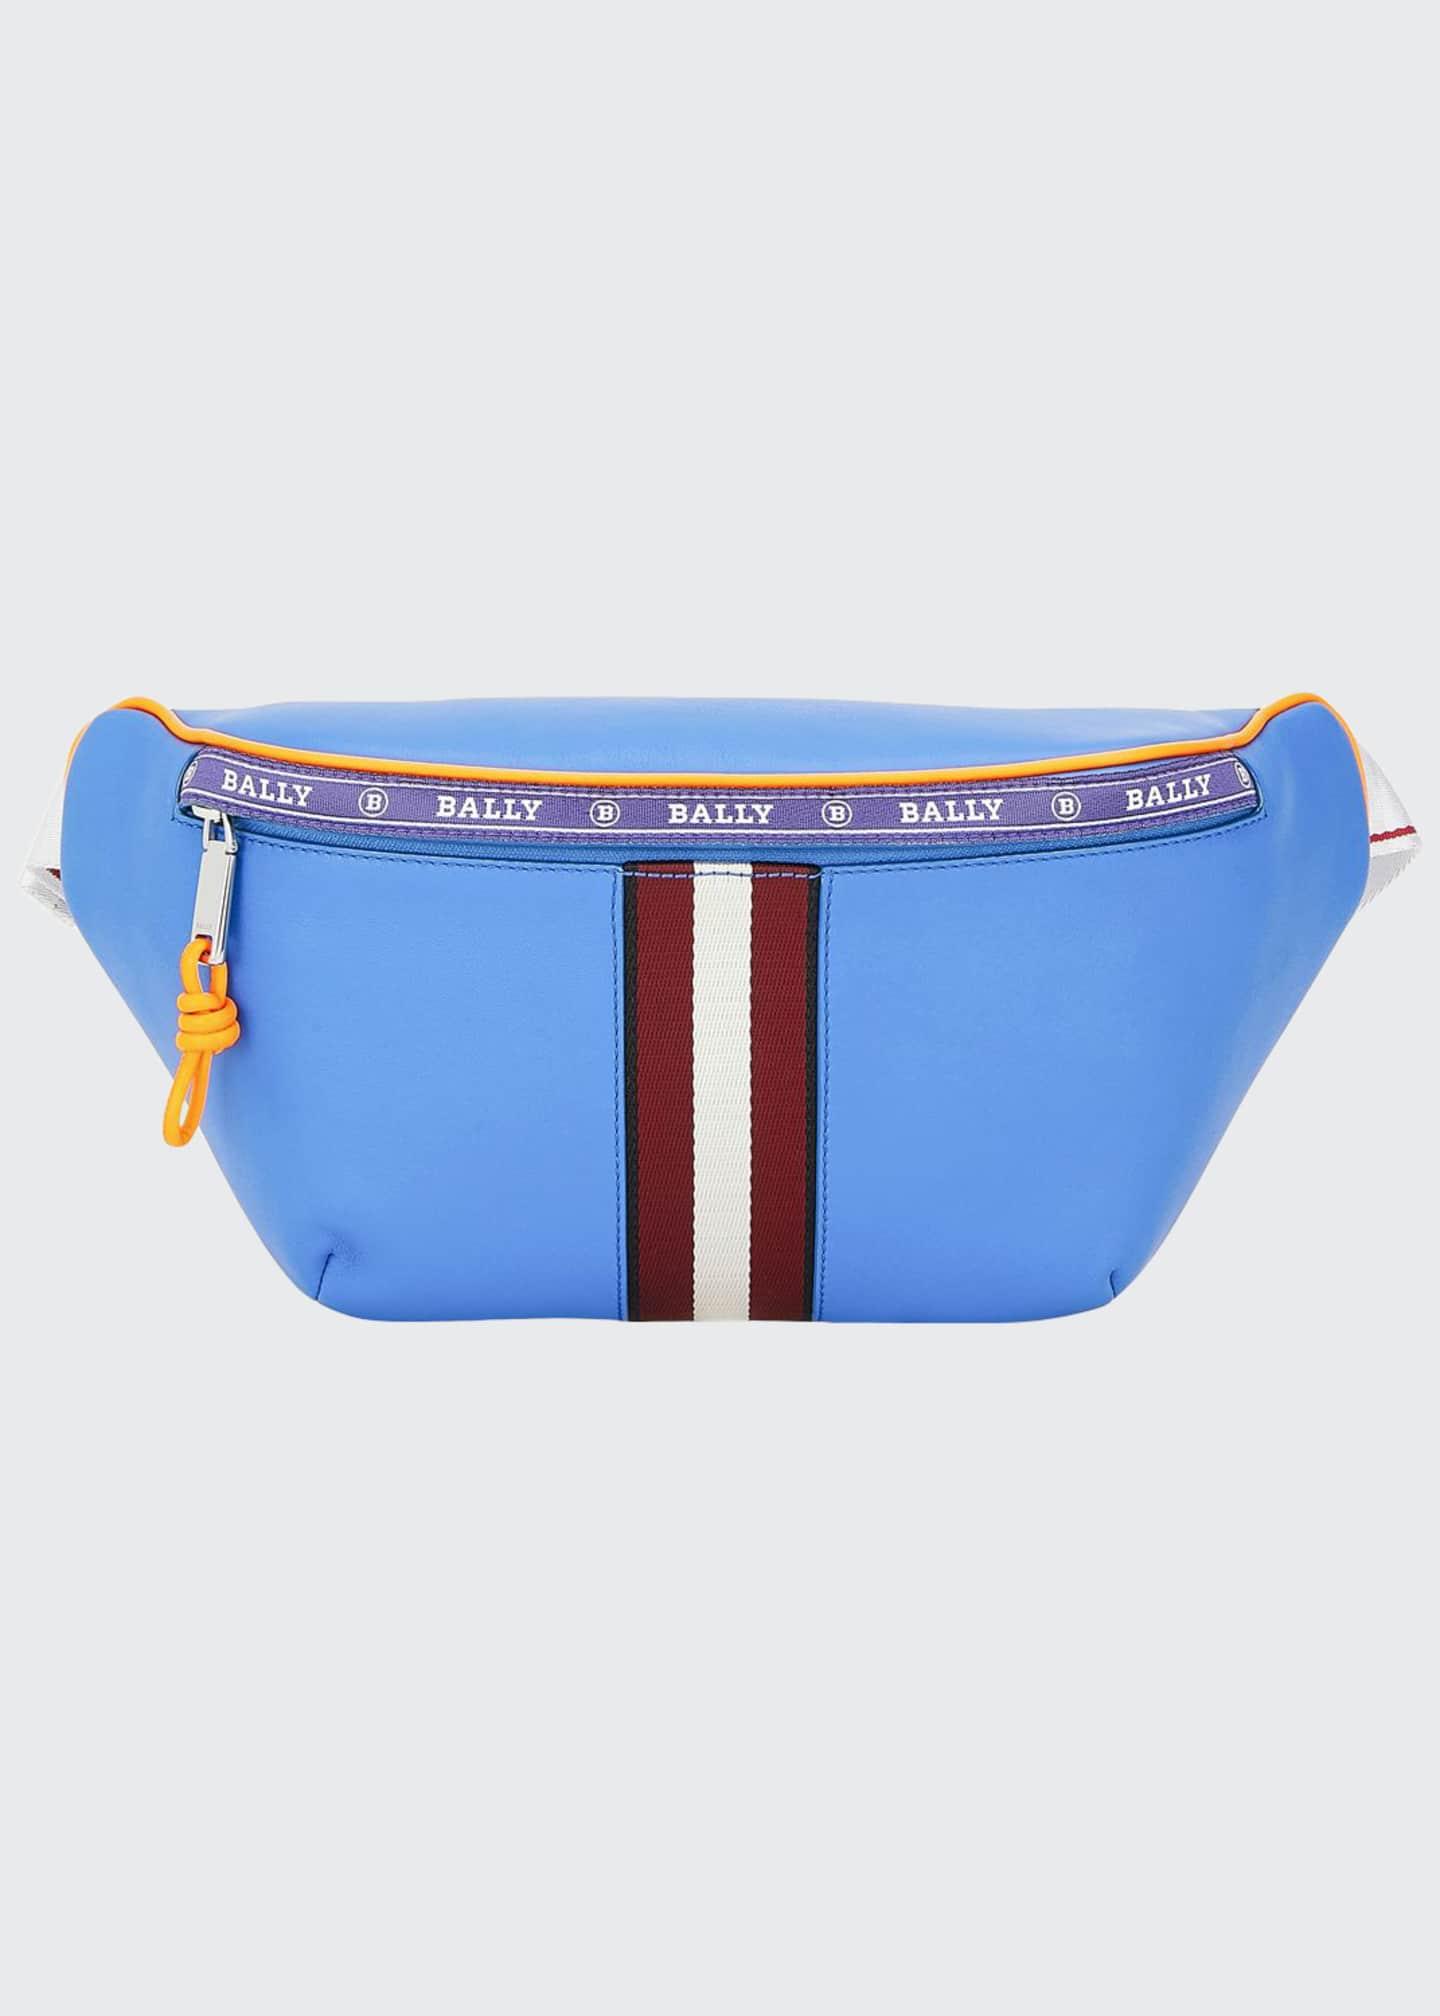 Bally Men's Trainspotting Leather Belt Bag/Fanny Pack